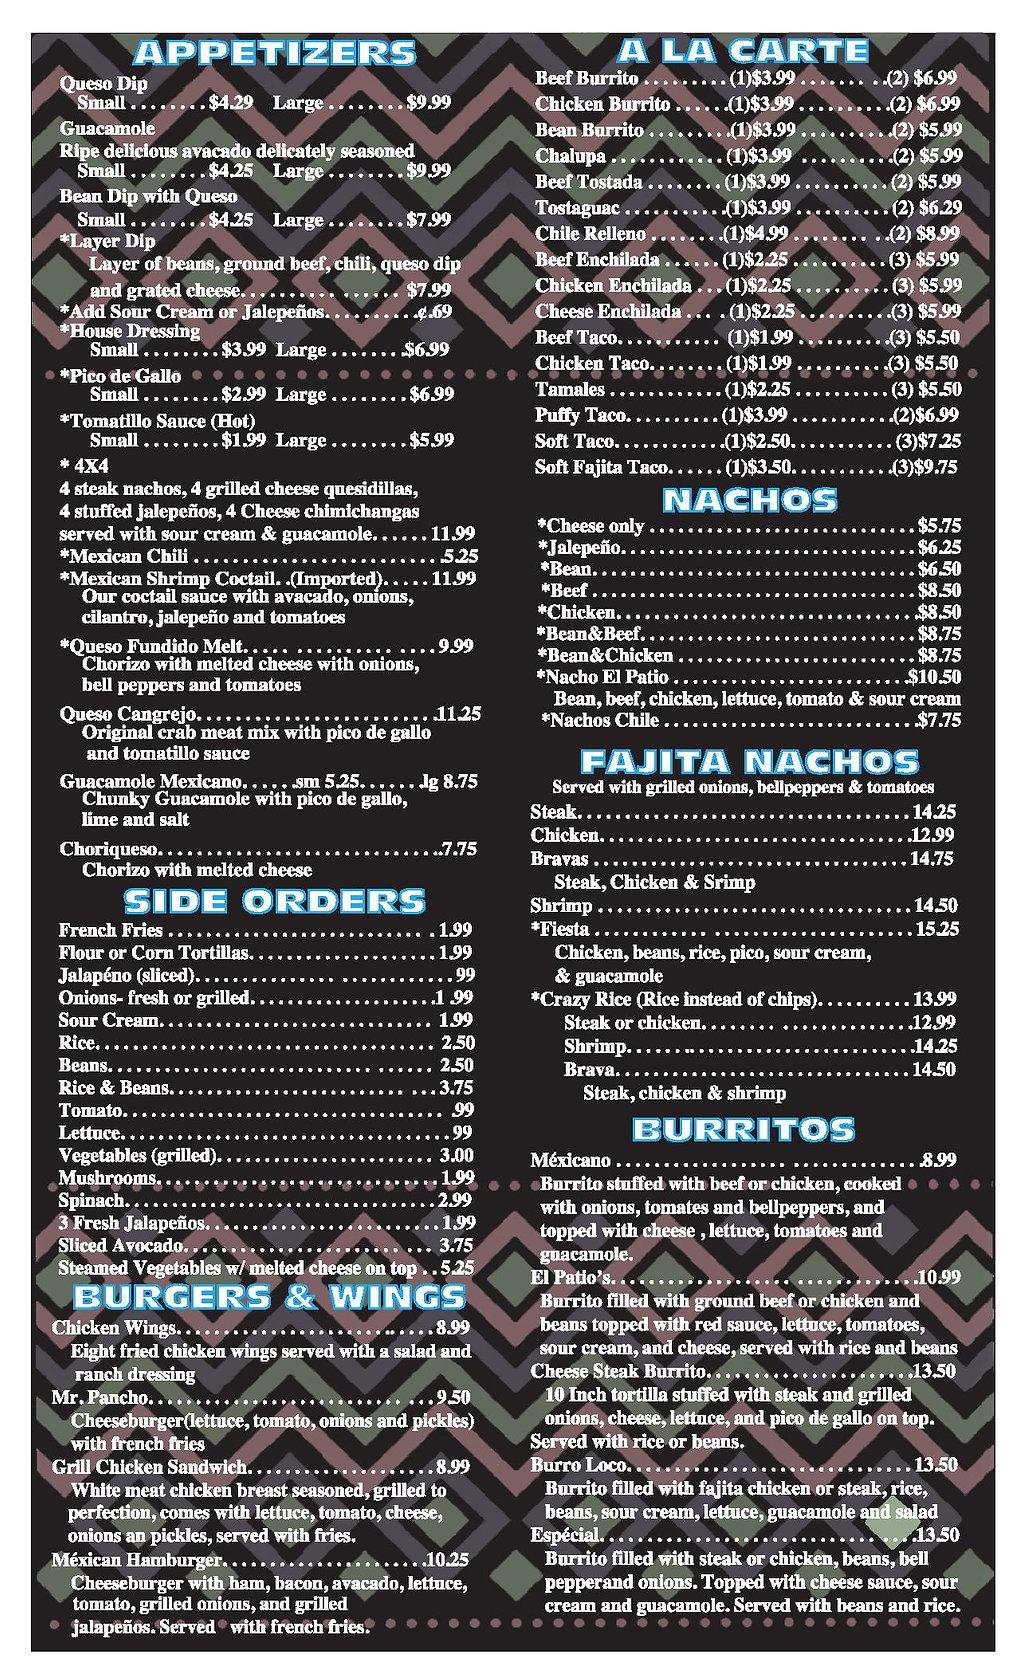 El Patio Shreveport menu pg 2 2020 OUTLI